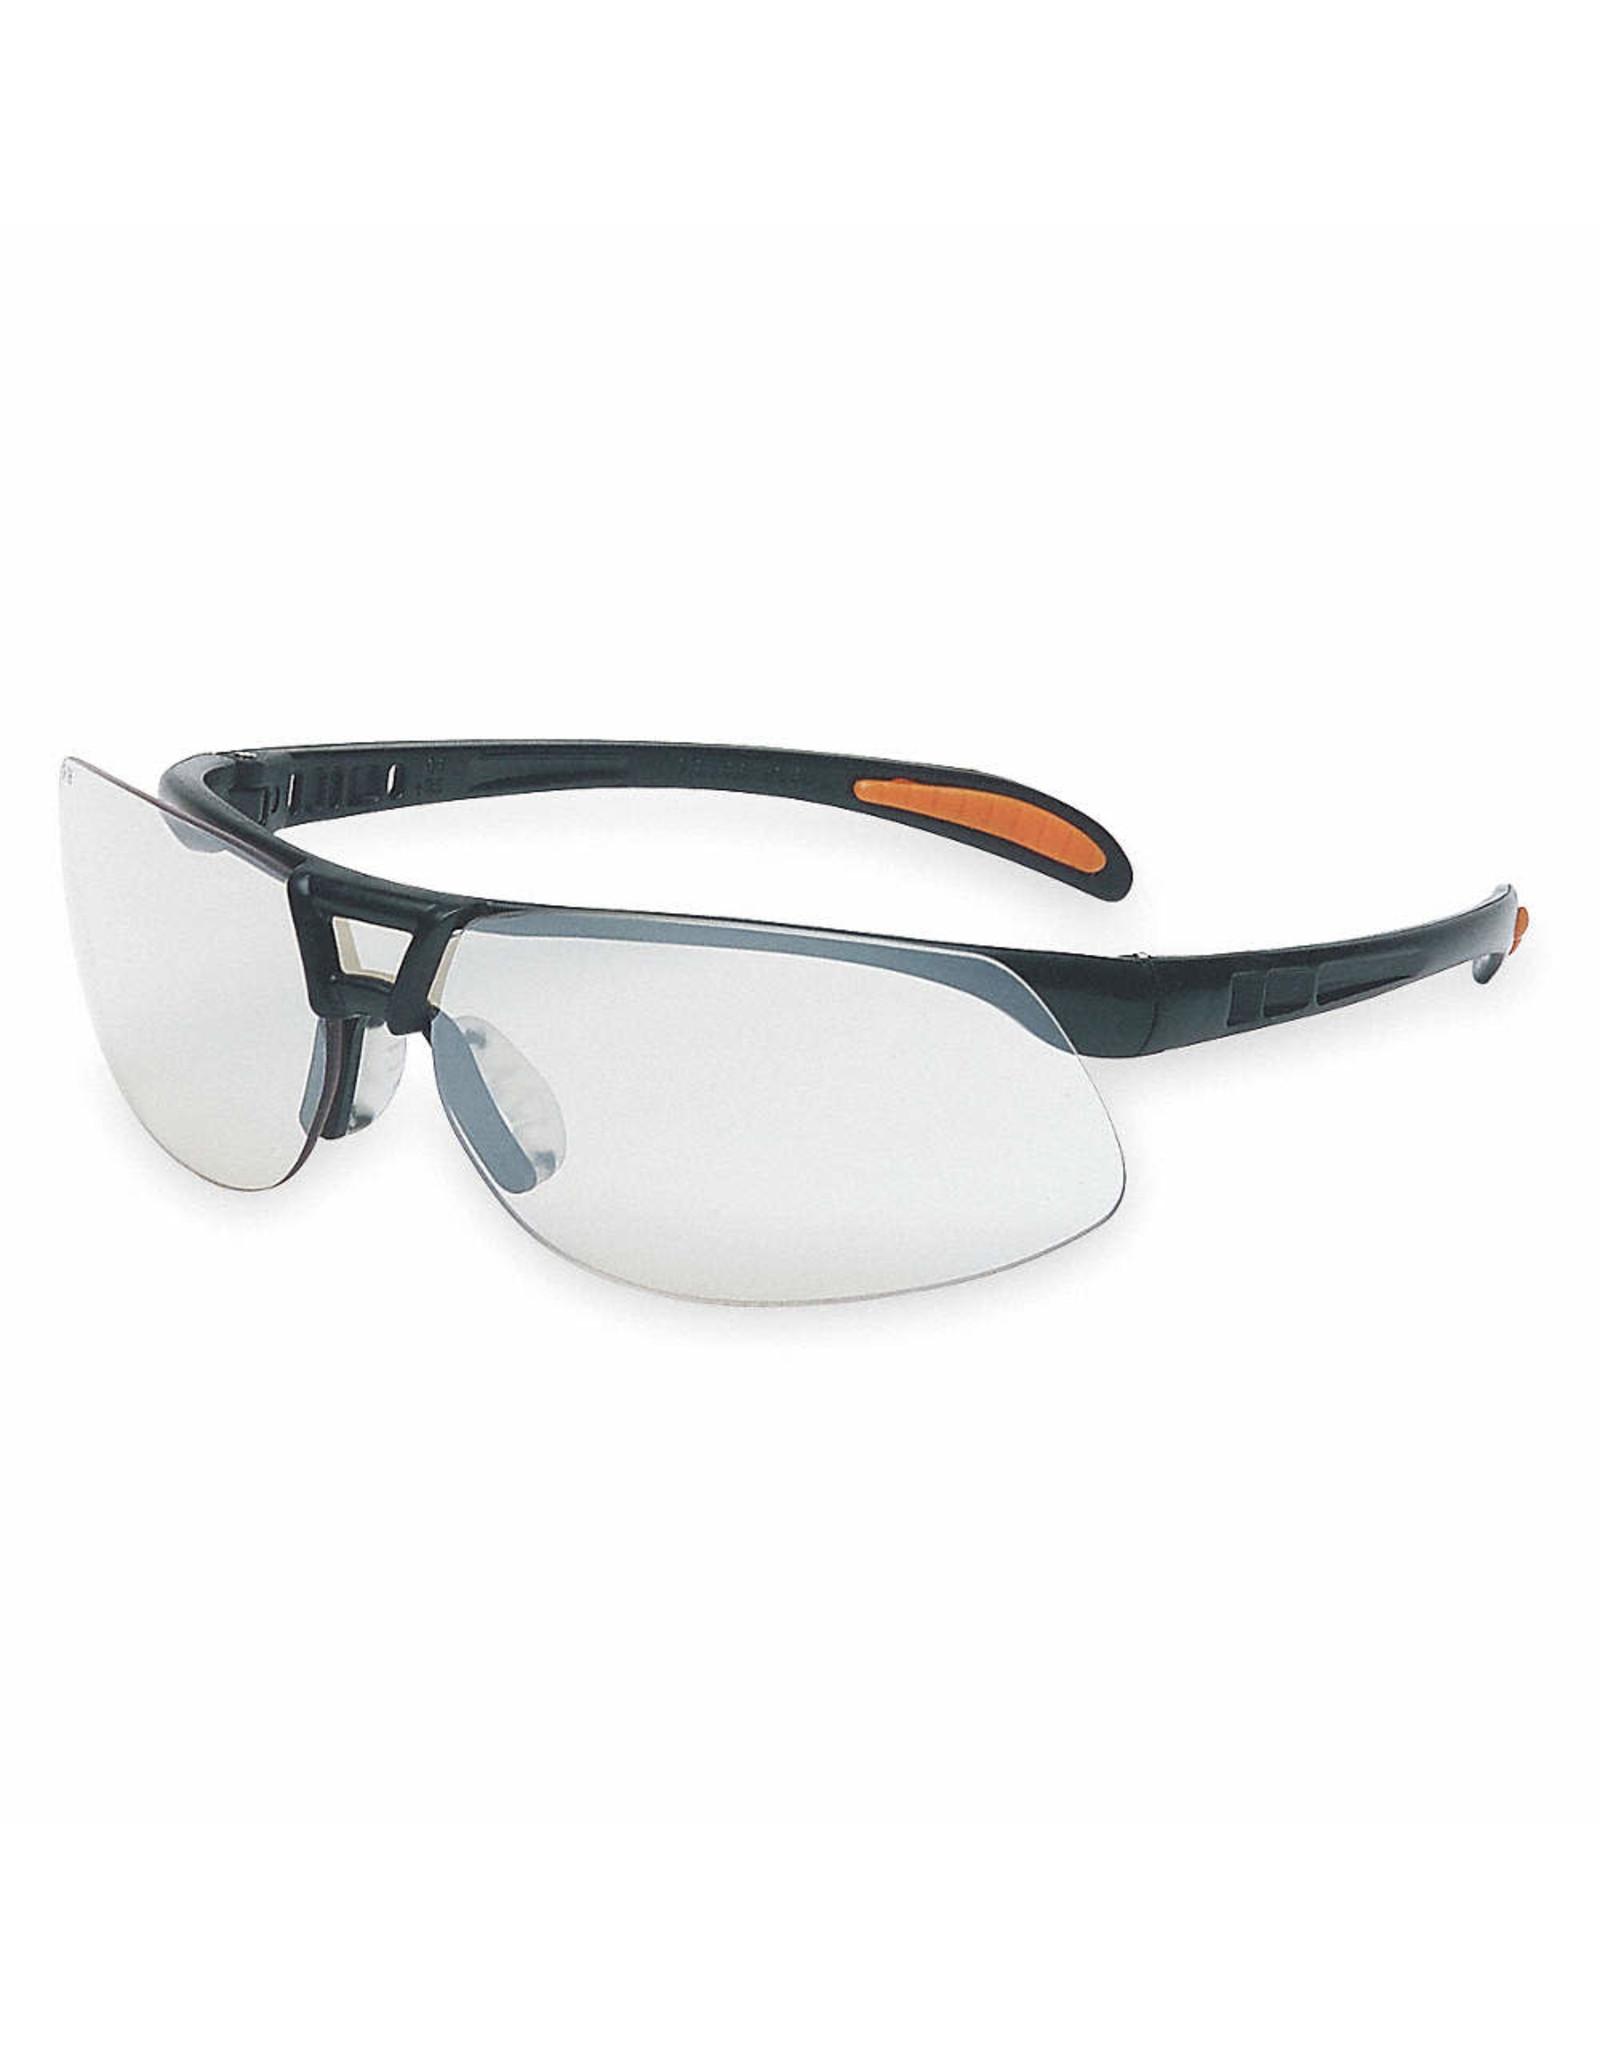 Uvex Protege Glasses